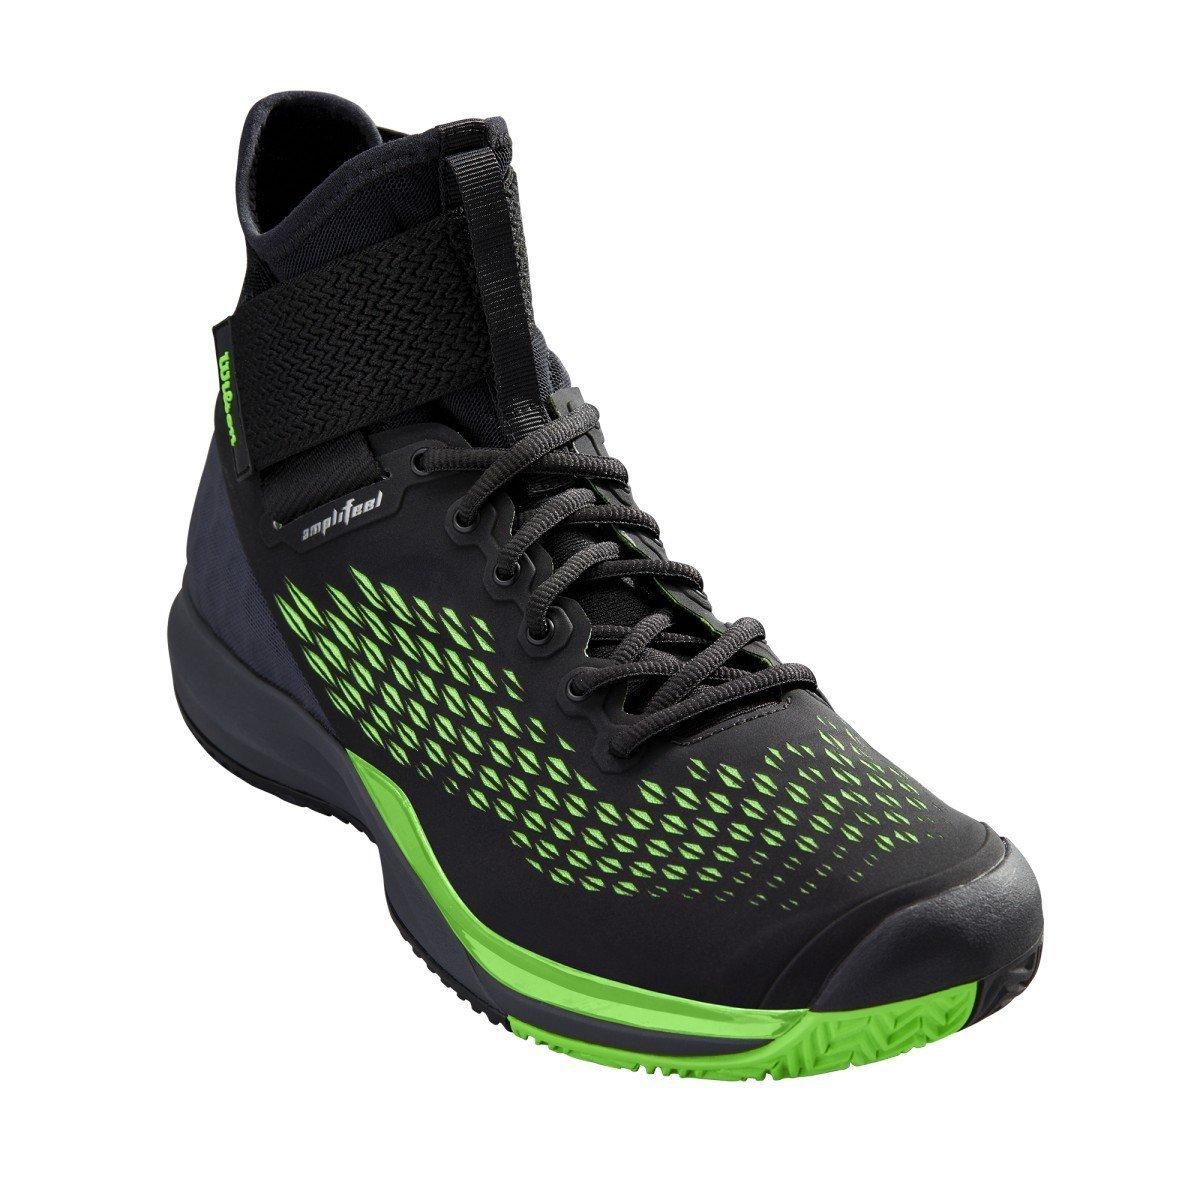 Wilson Tennis Shoes – Amplifeel 2.0 (Blade V7)